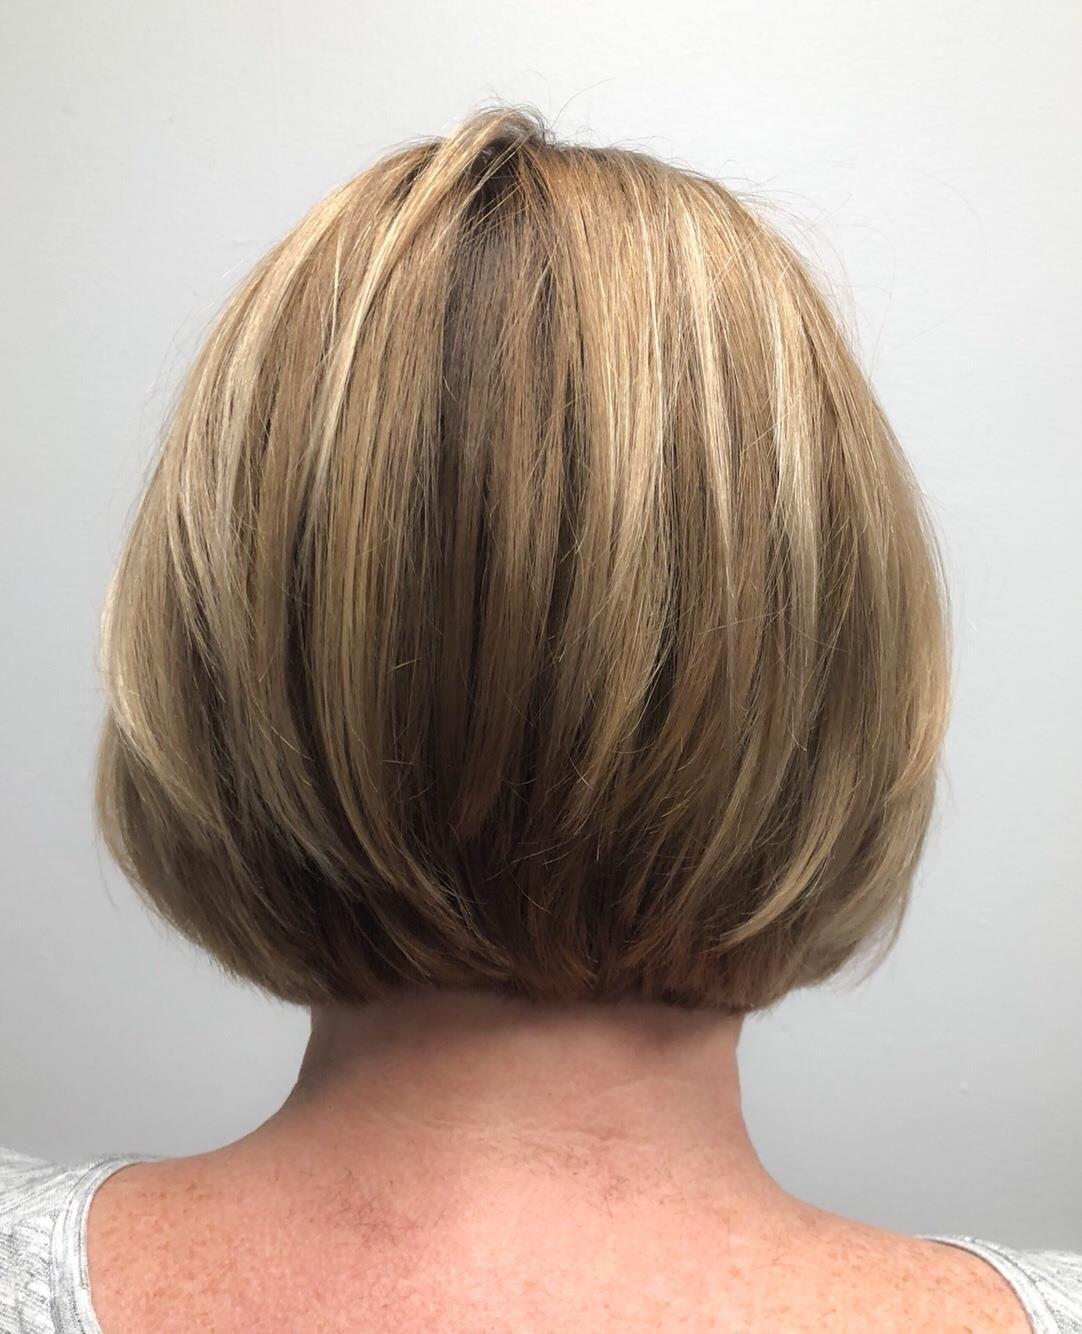 Pin on Short Hair Ideas For Women